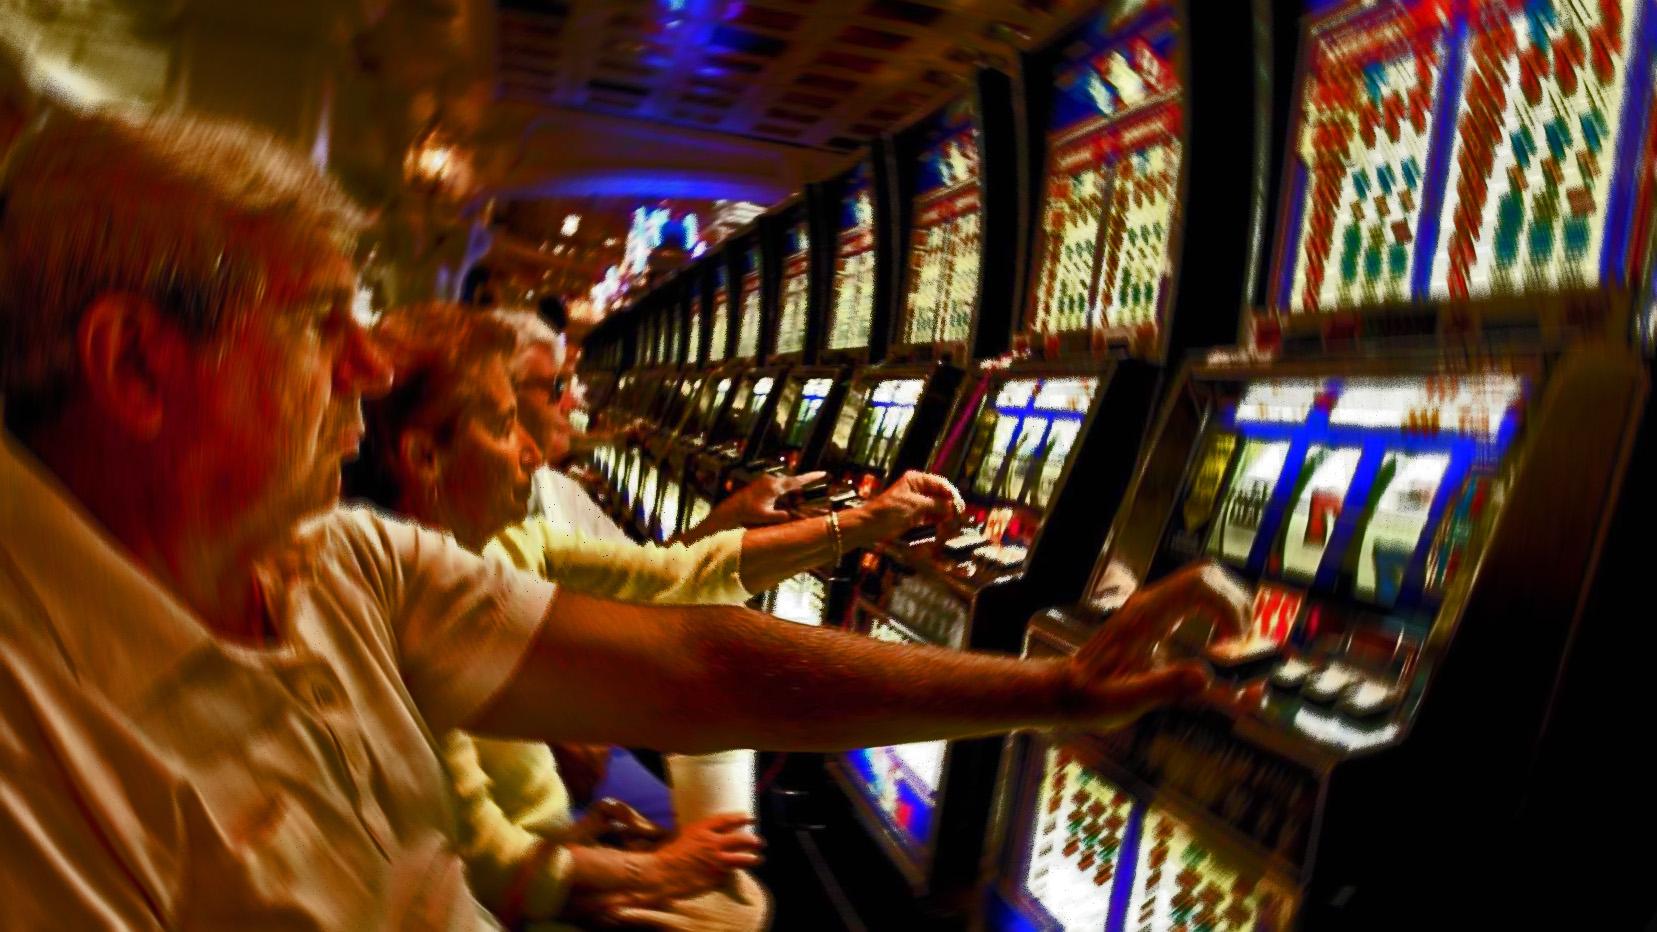 slot machines generate 70 of casino revenues in the united states